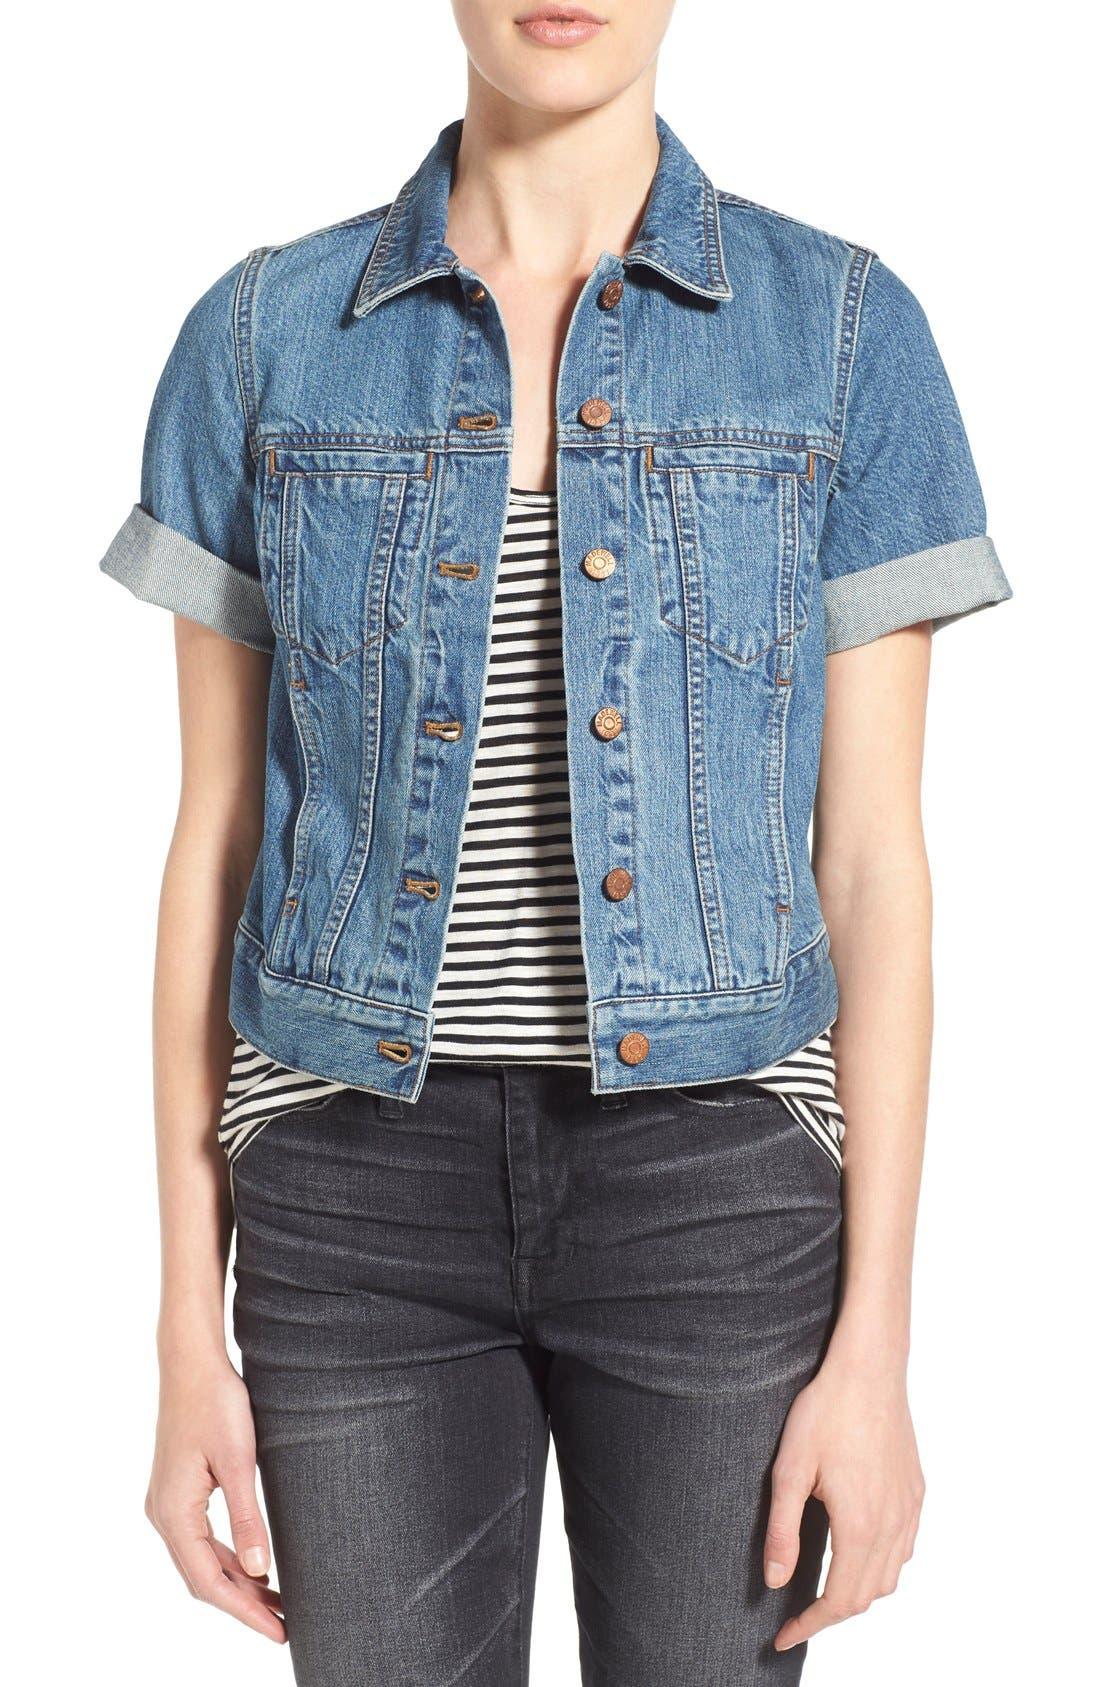 Alternate Image 1 Selected - Madewell 'Summer' Short Sleeve Denim Jacket